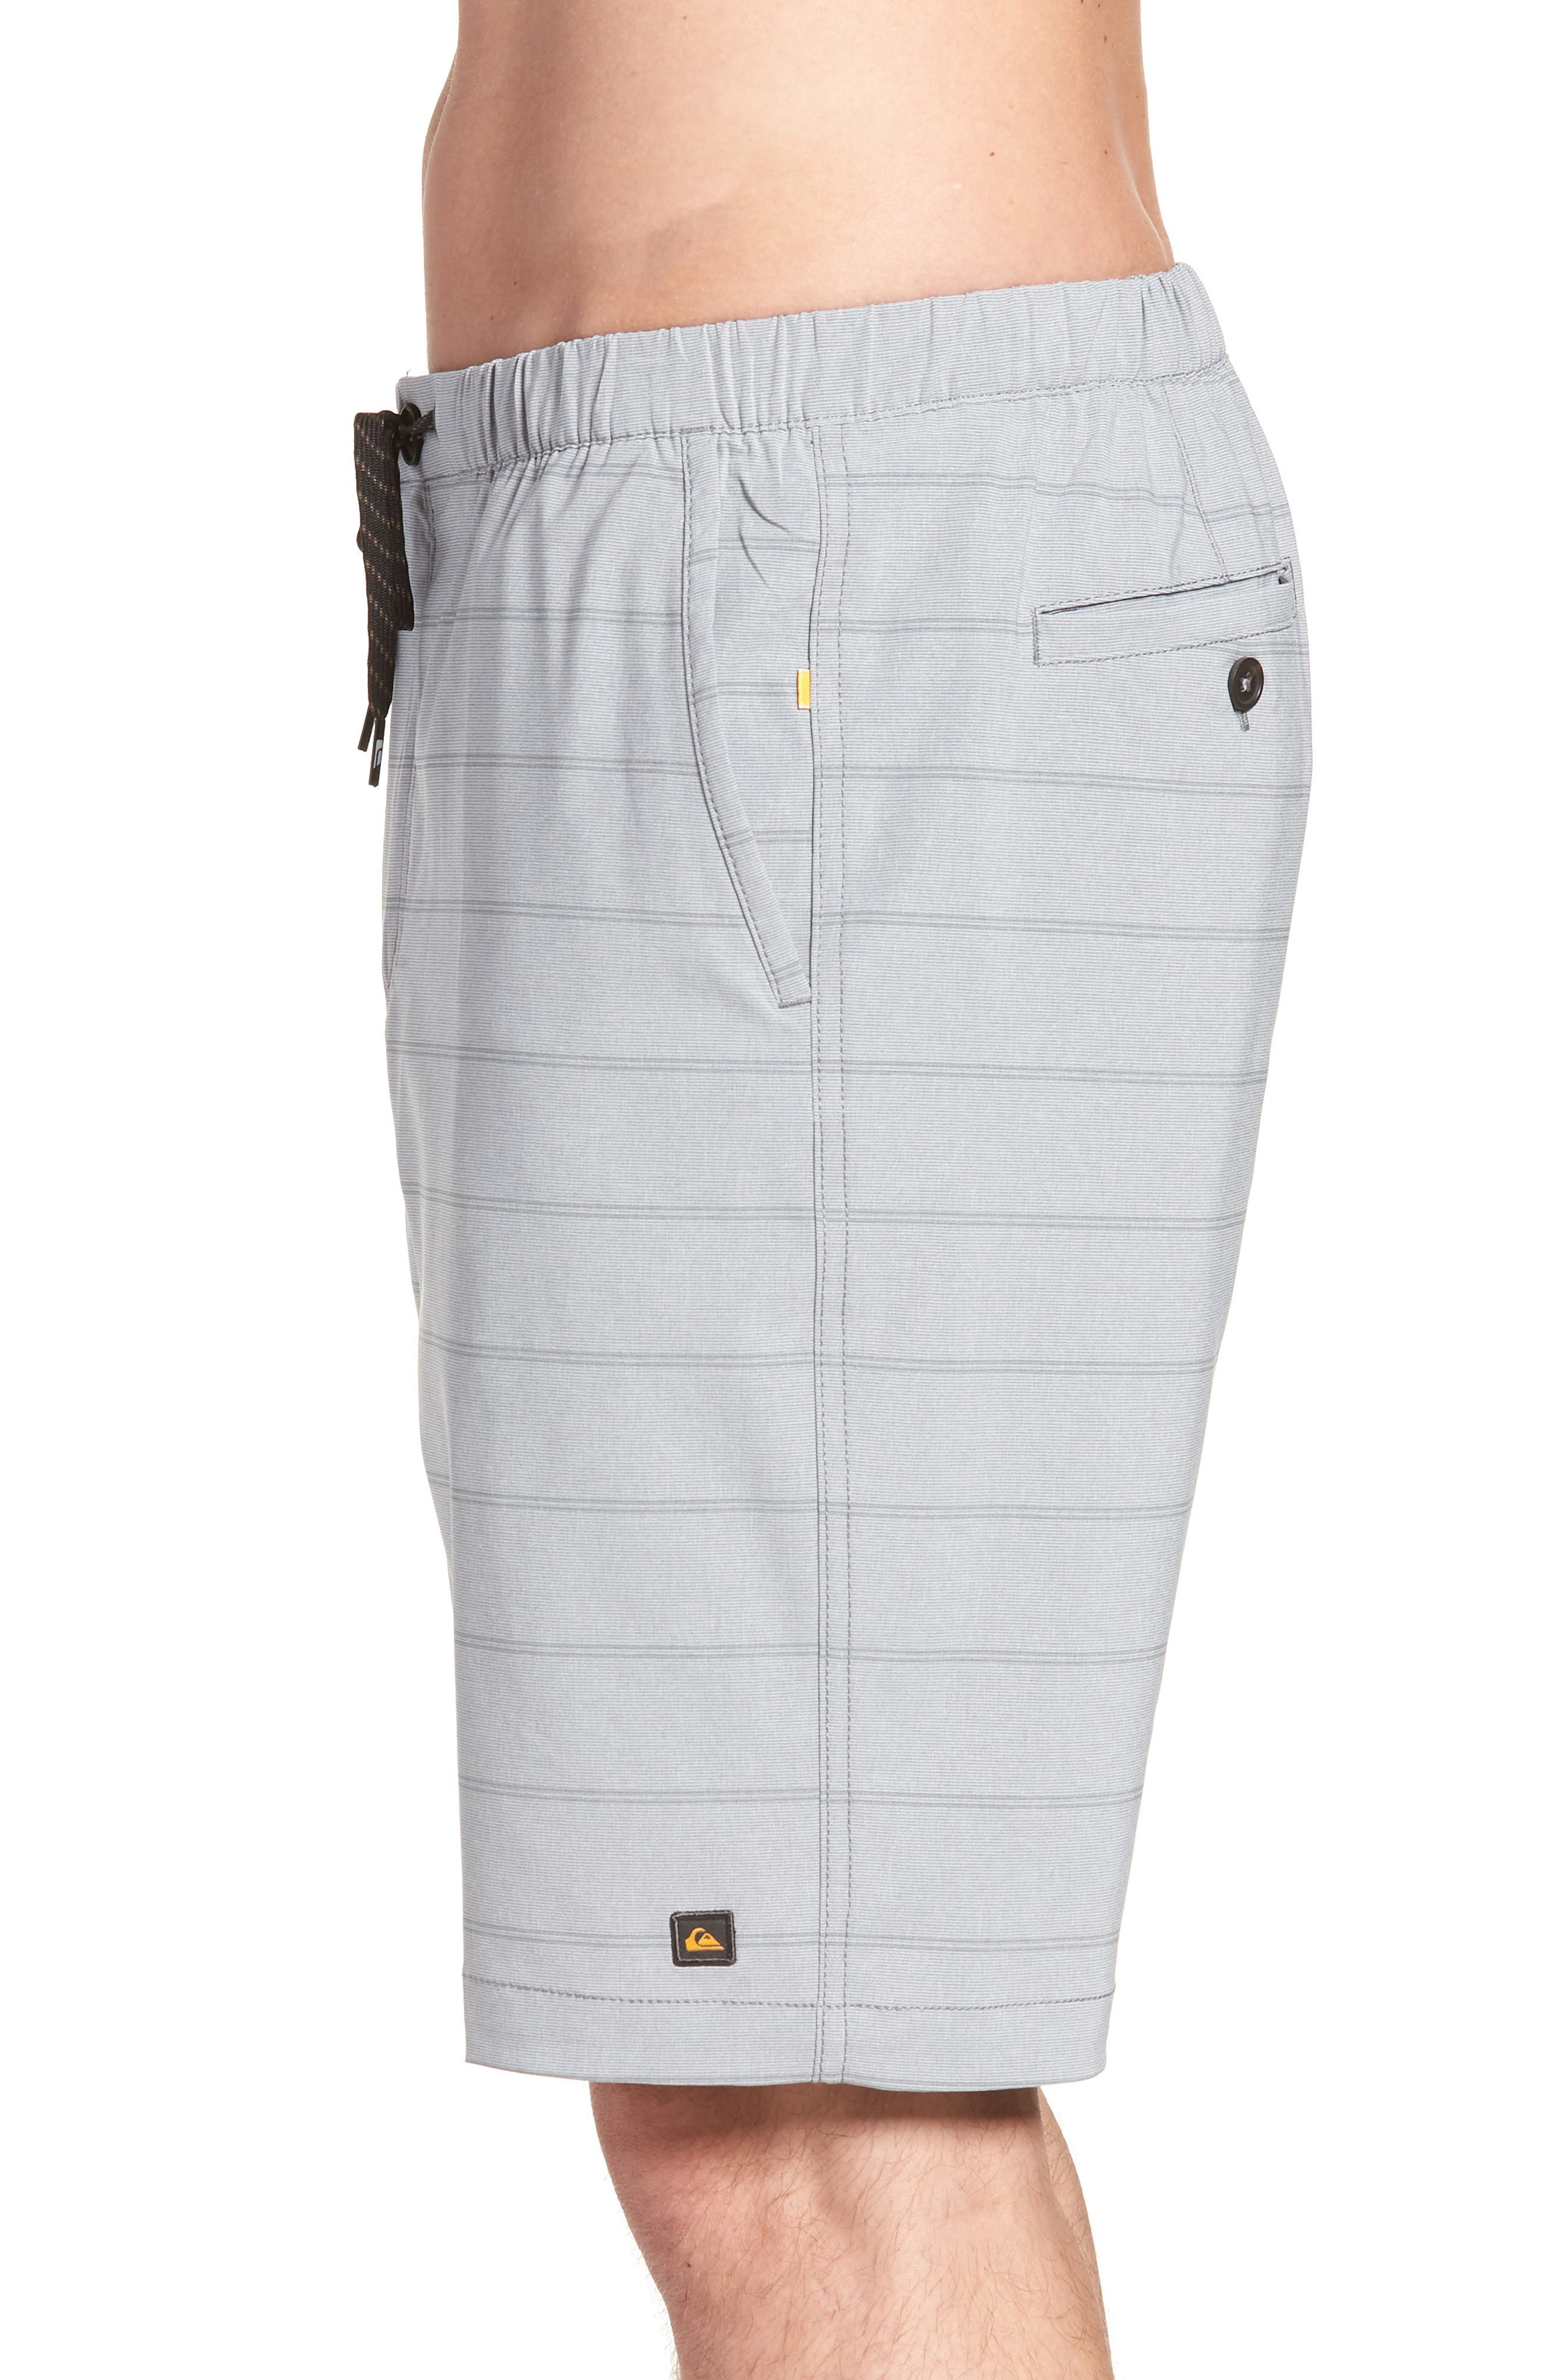 Suva Amphibian Hybrid Shorts,                             Alternate thumbnail 4, color,                             STEEPLE GRAY